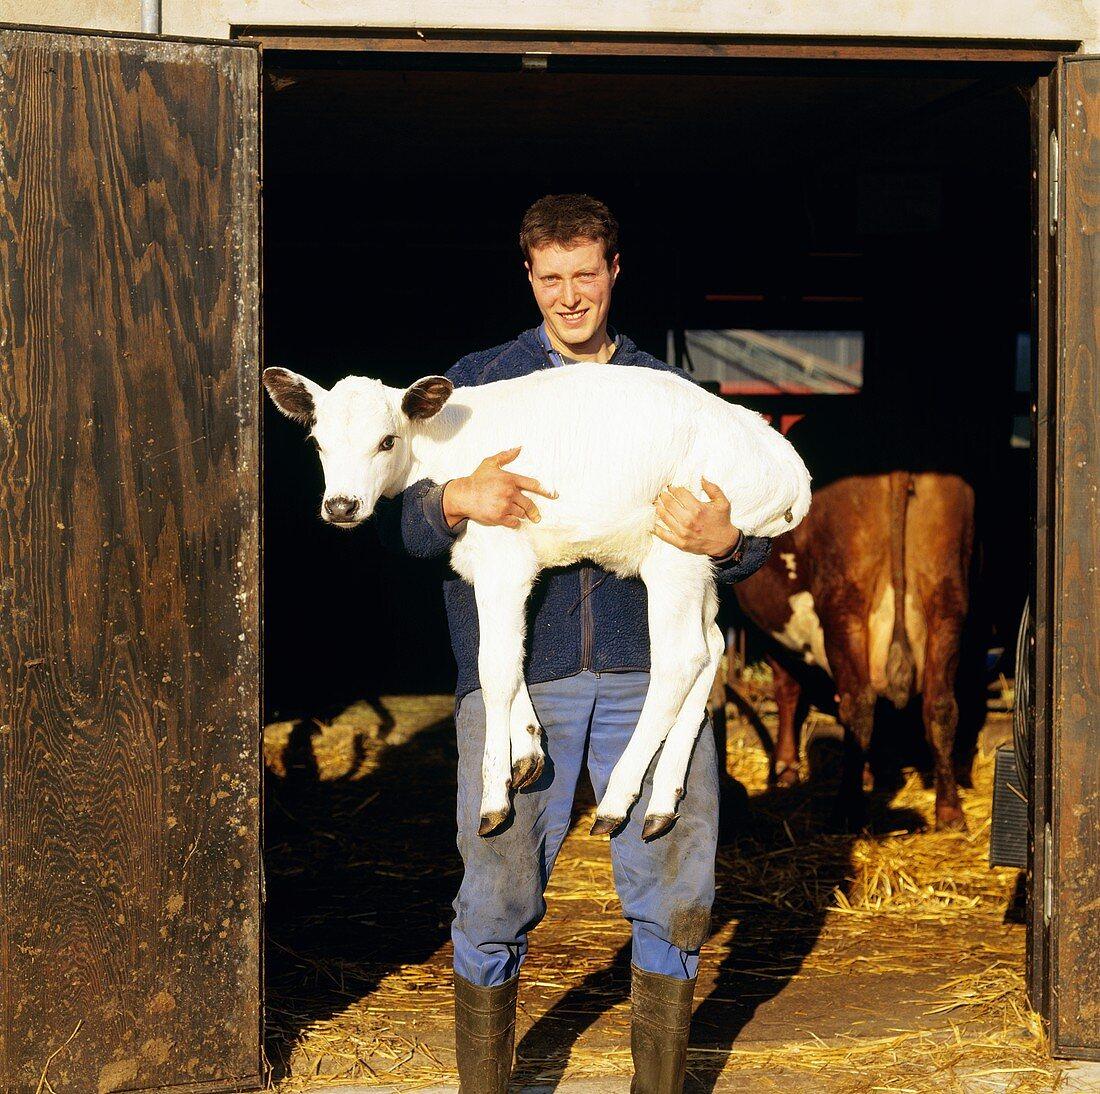 Farmer carrying a calf